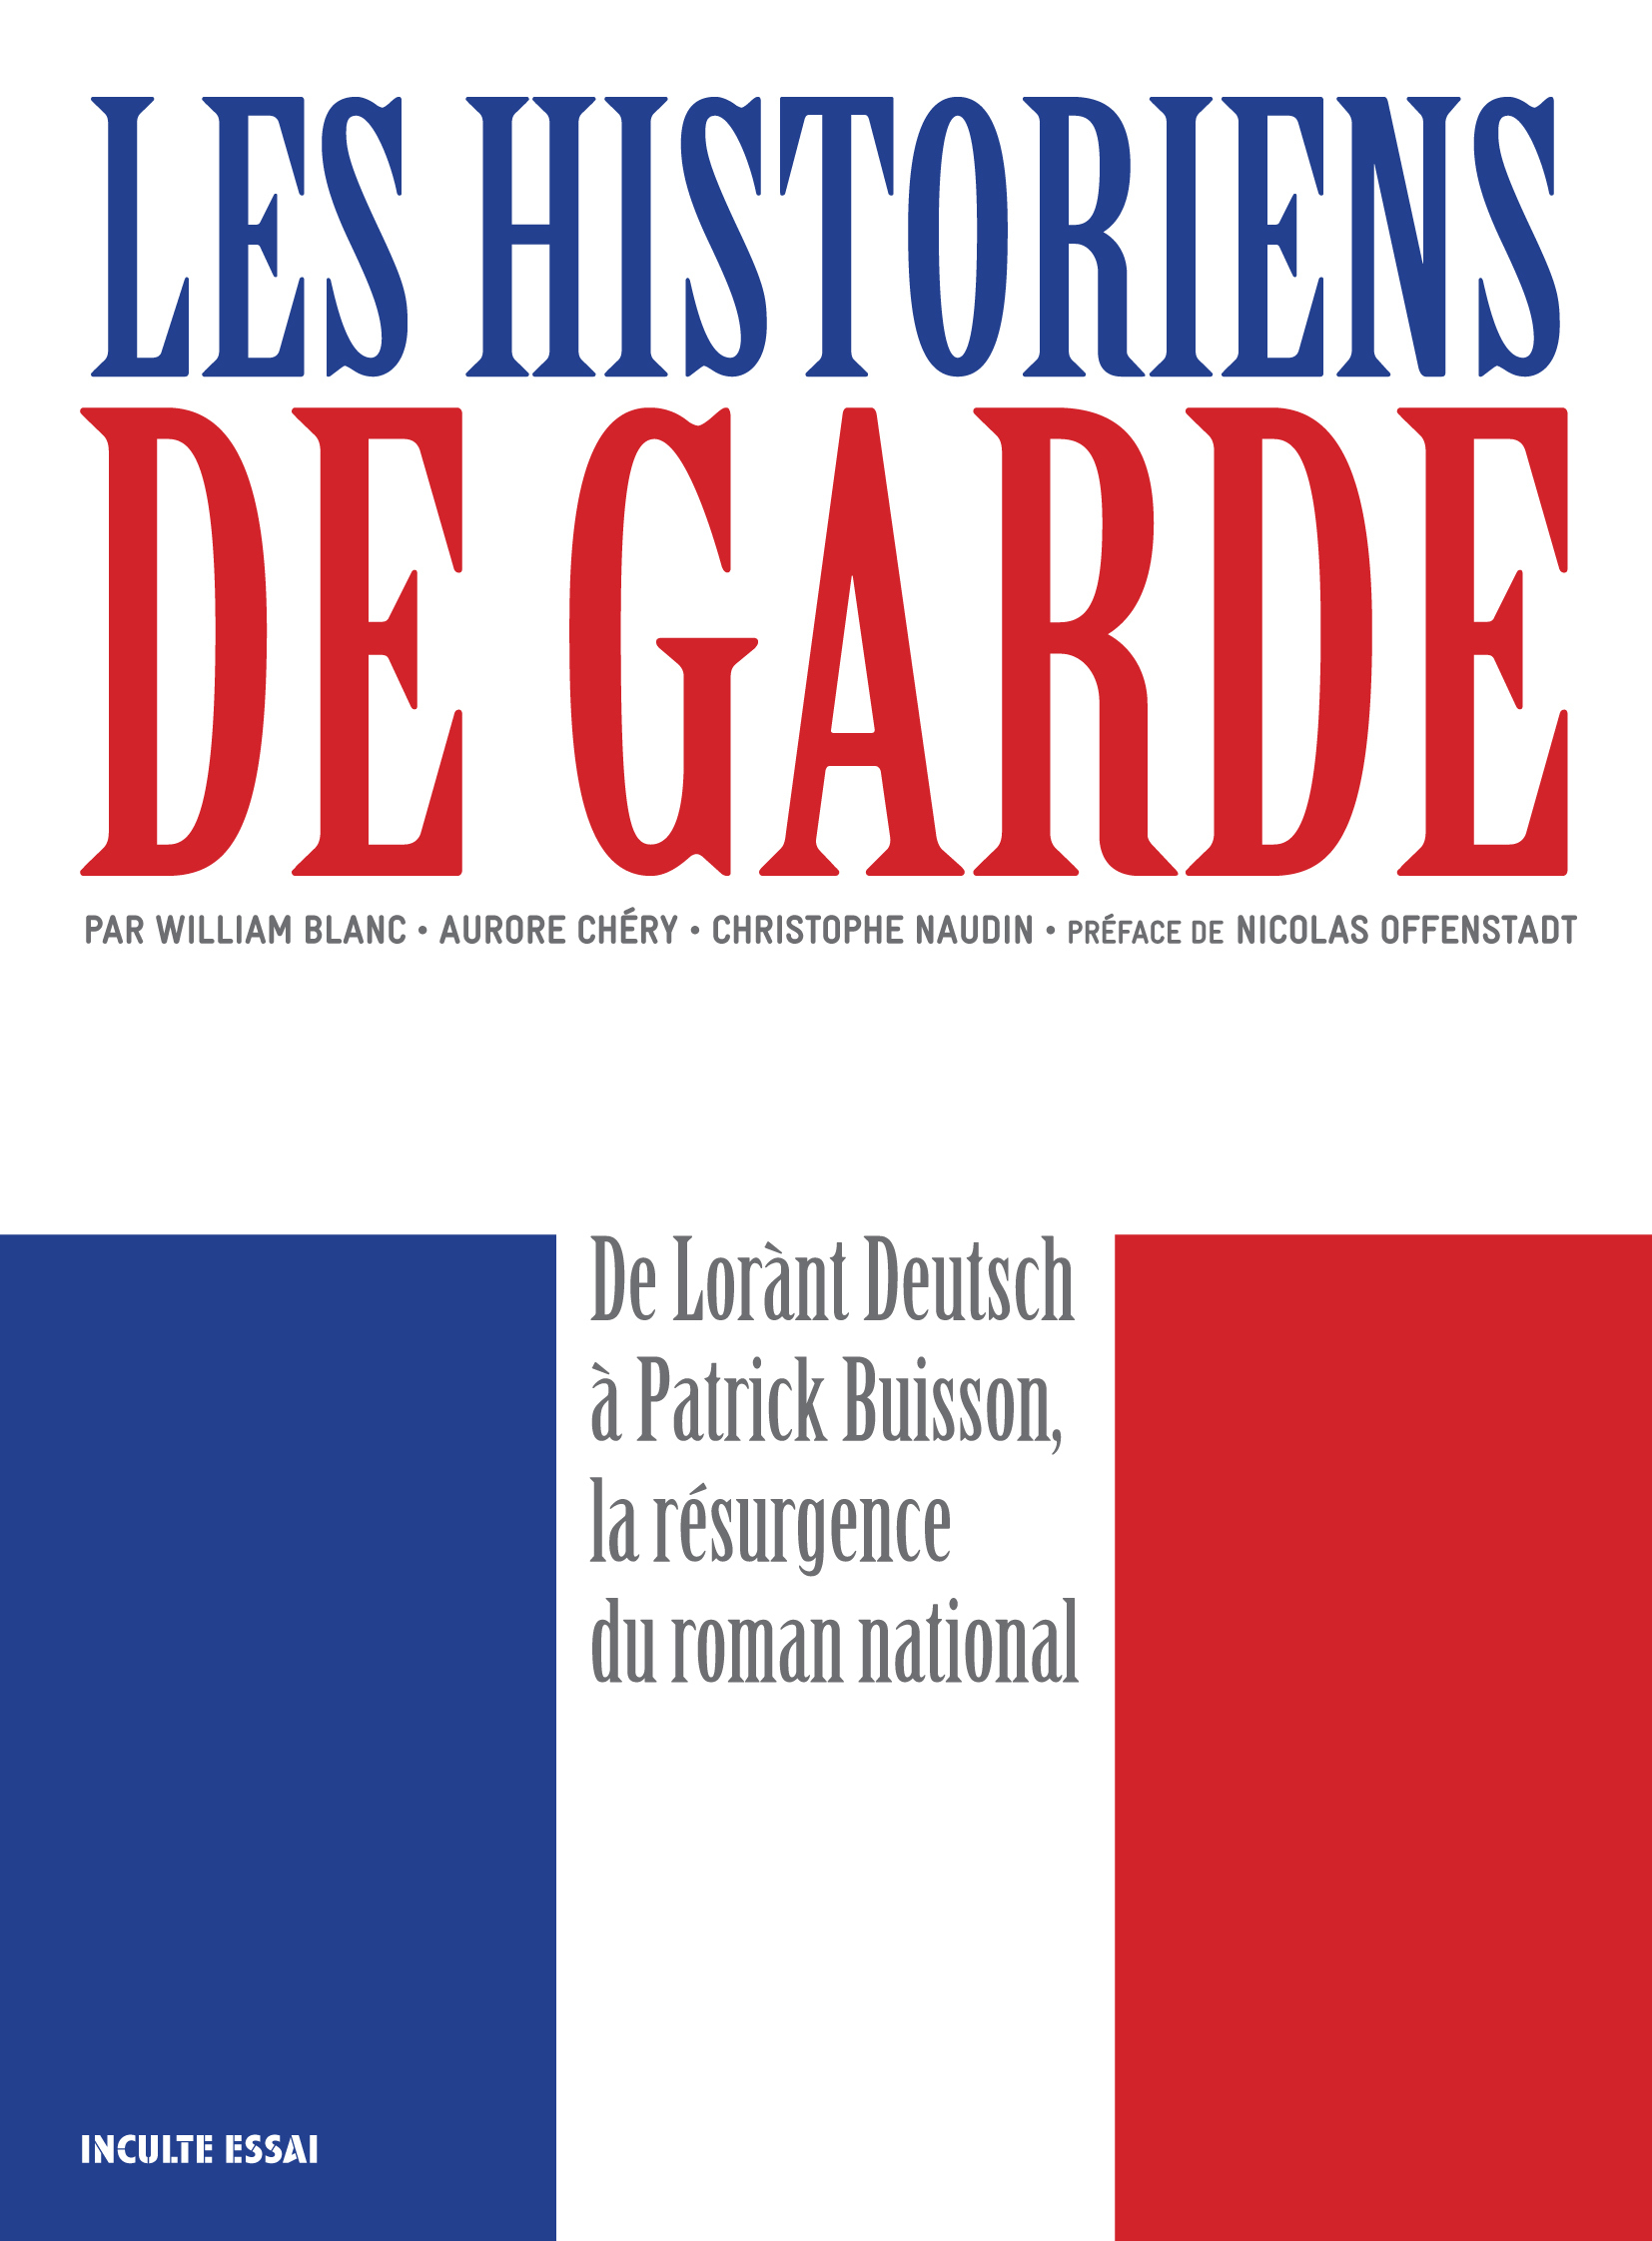 2013-03-27-les_historiens_de_garde_4.jpg